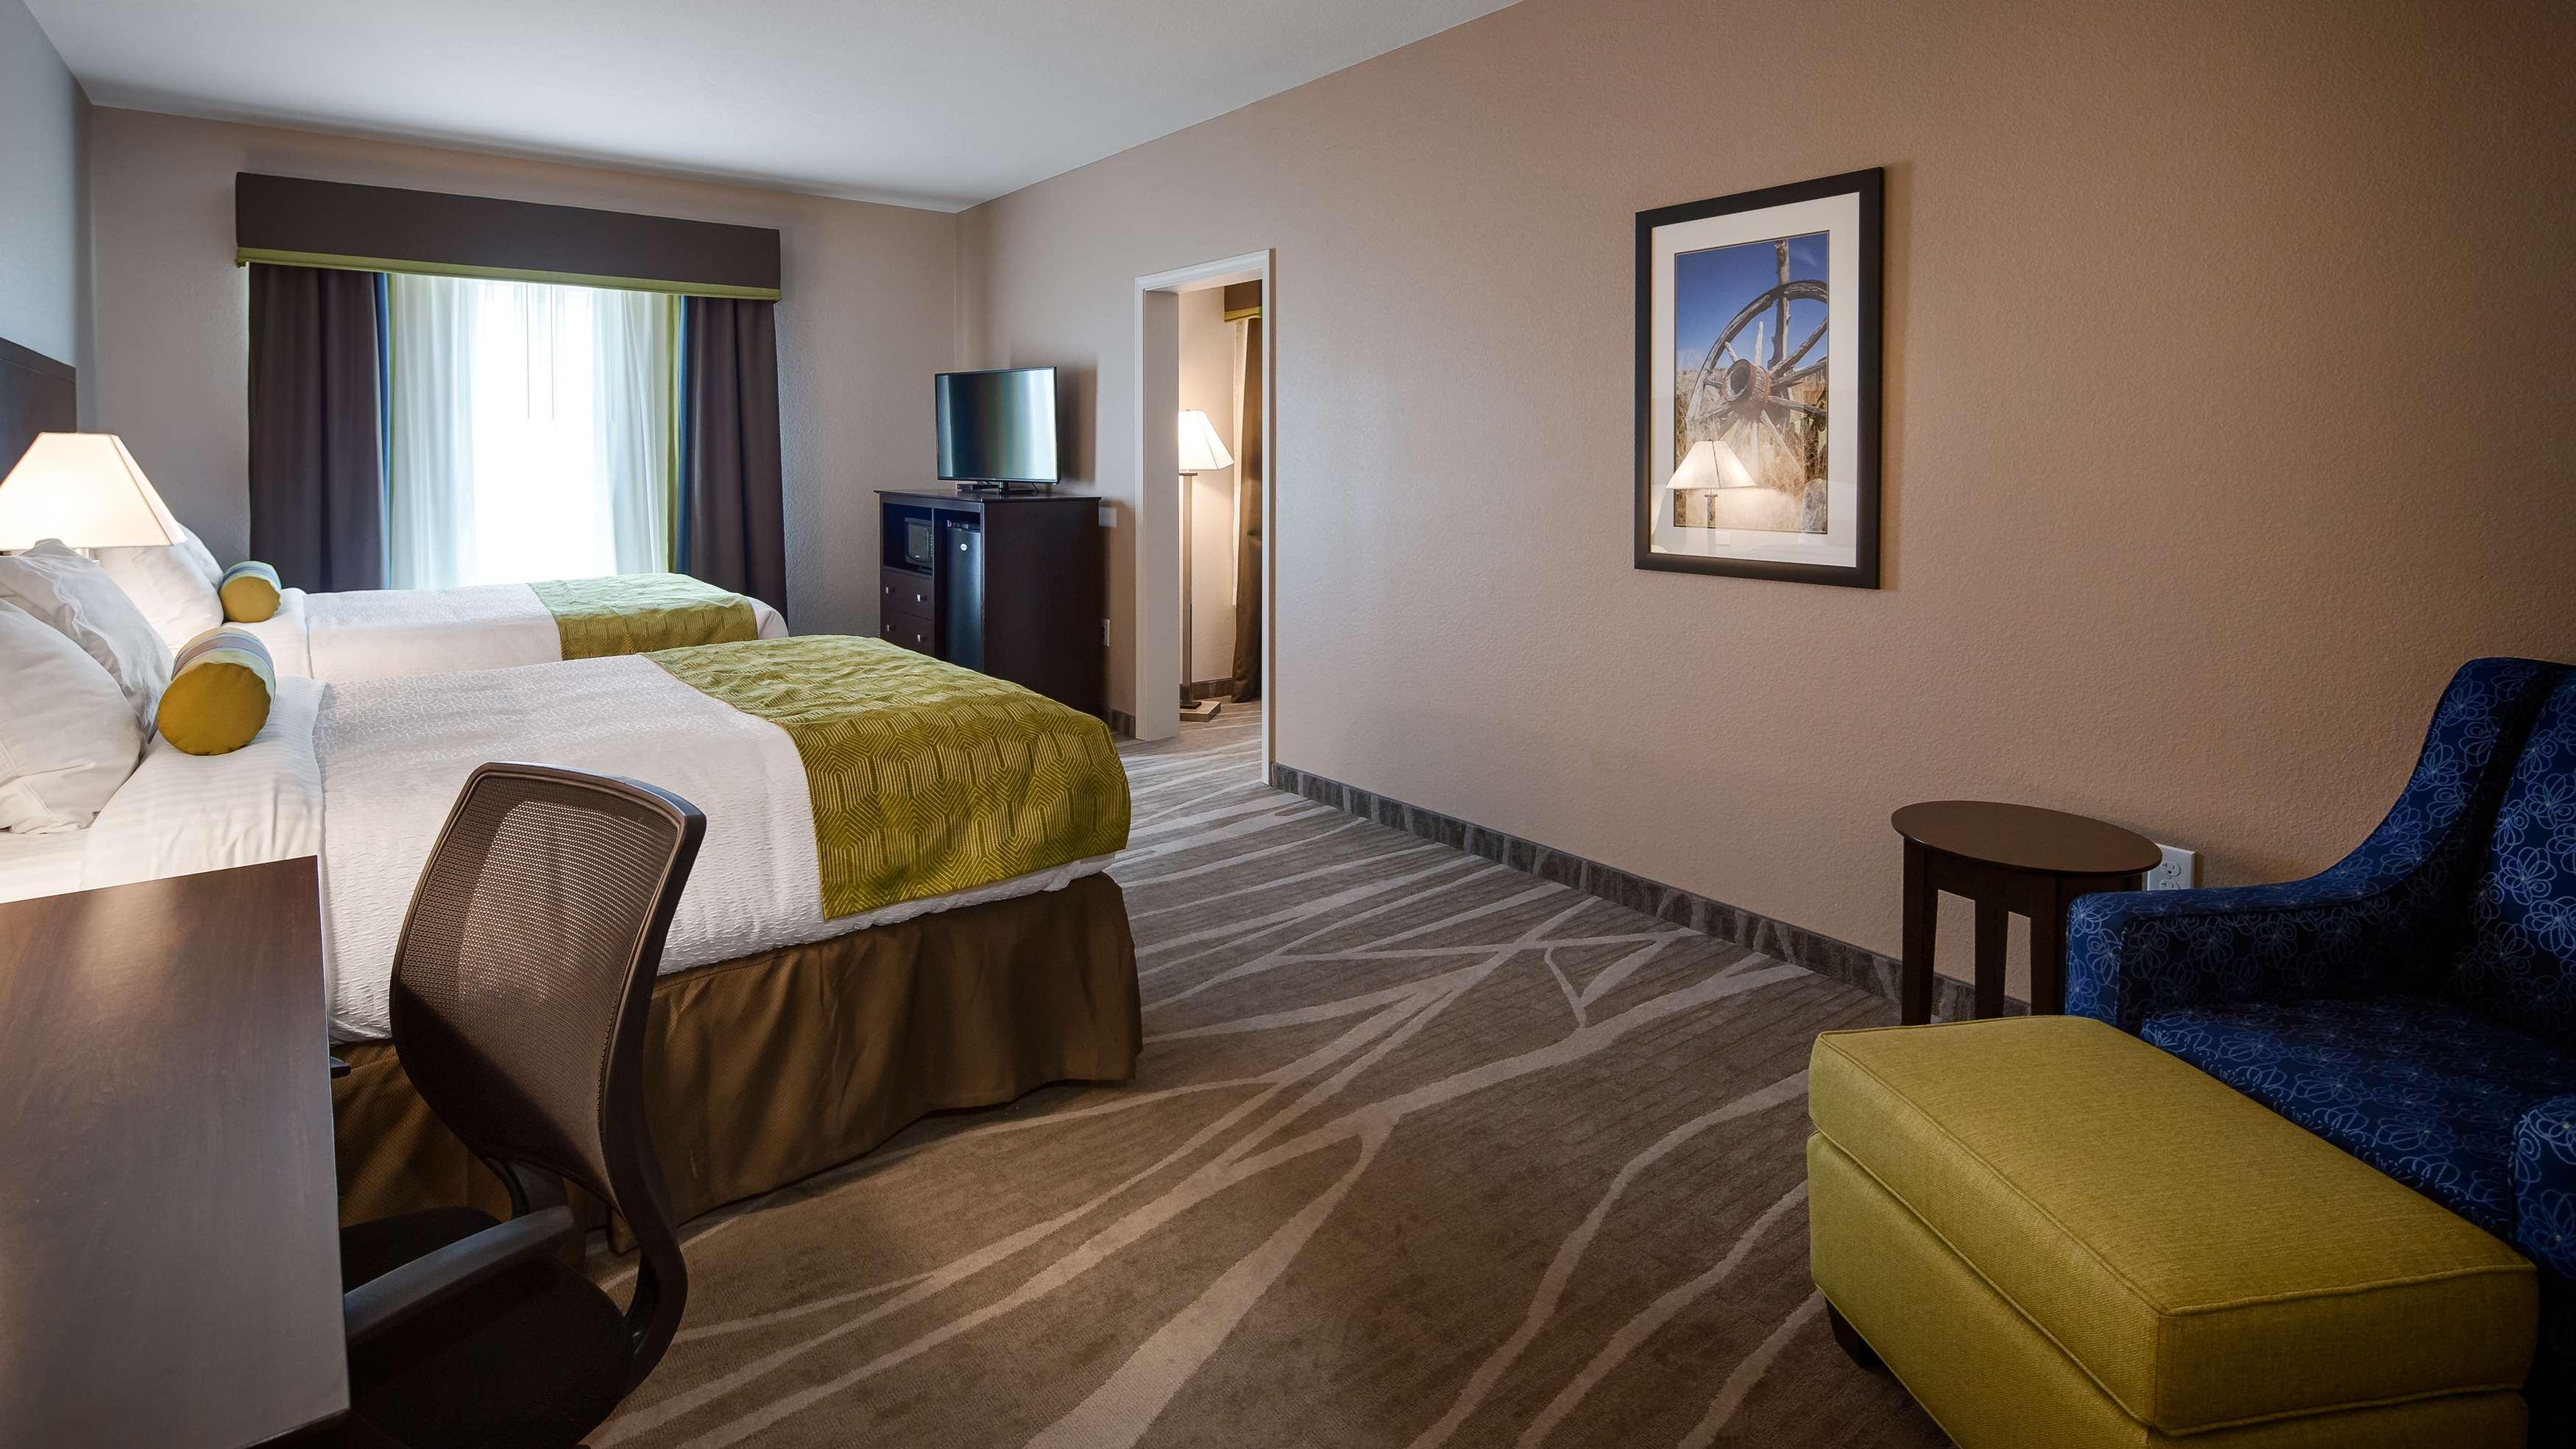 Best Western Plus Denver City Hotel & Suites image 16